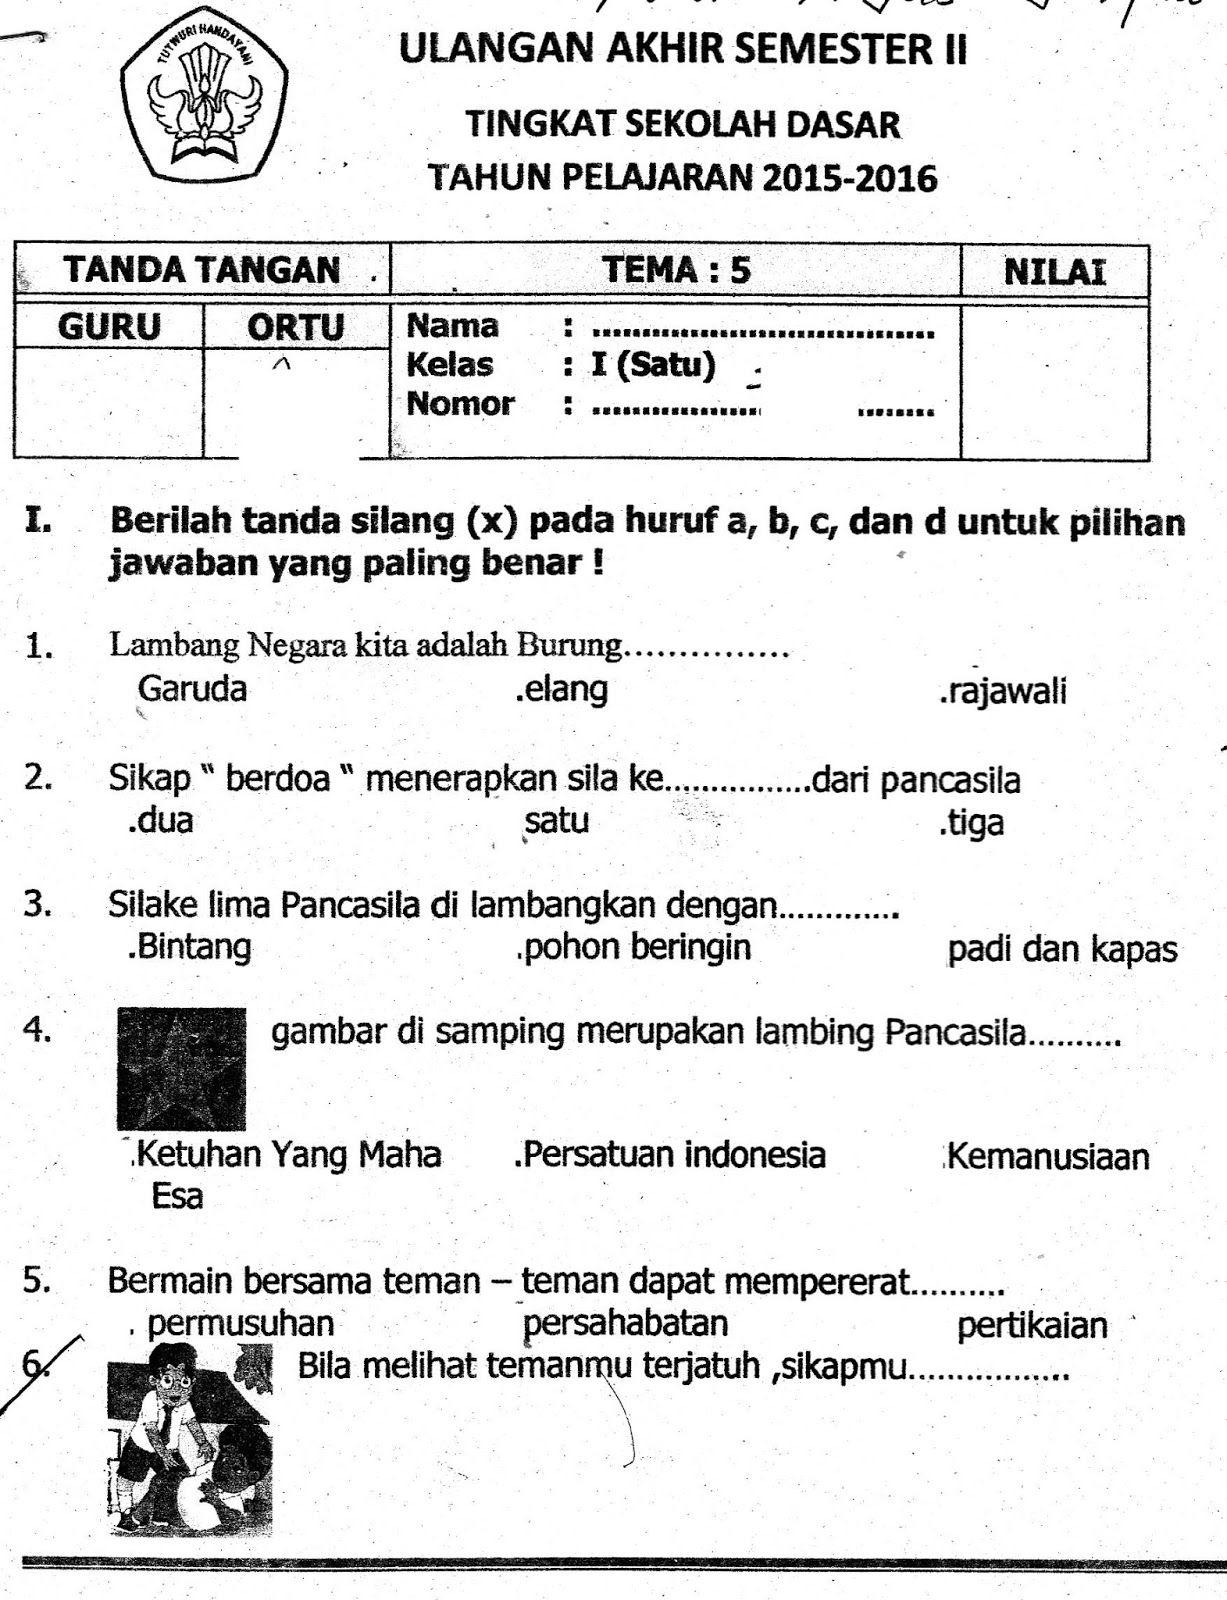 Soal Uts Tema 5 Subtema 4 Kelas 1 Sd